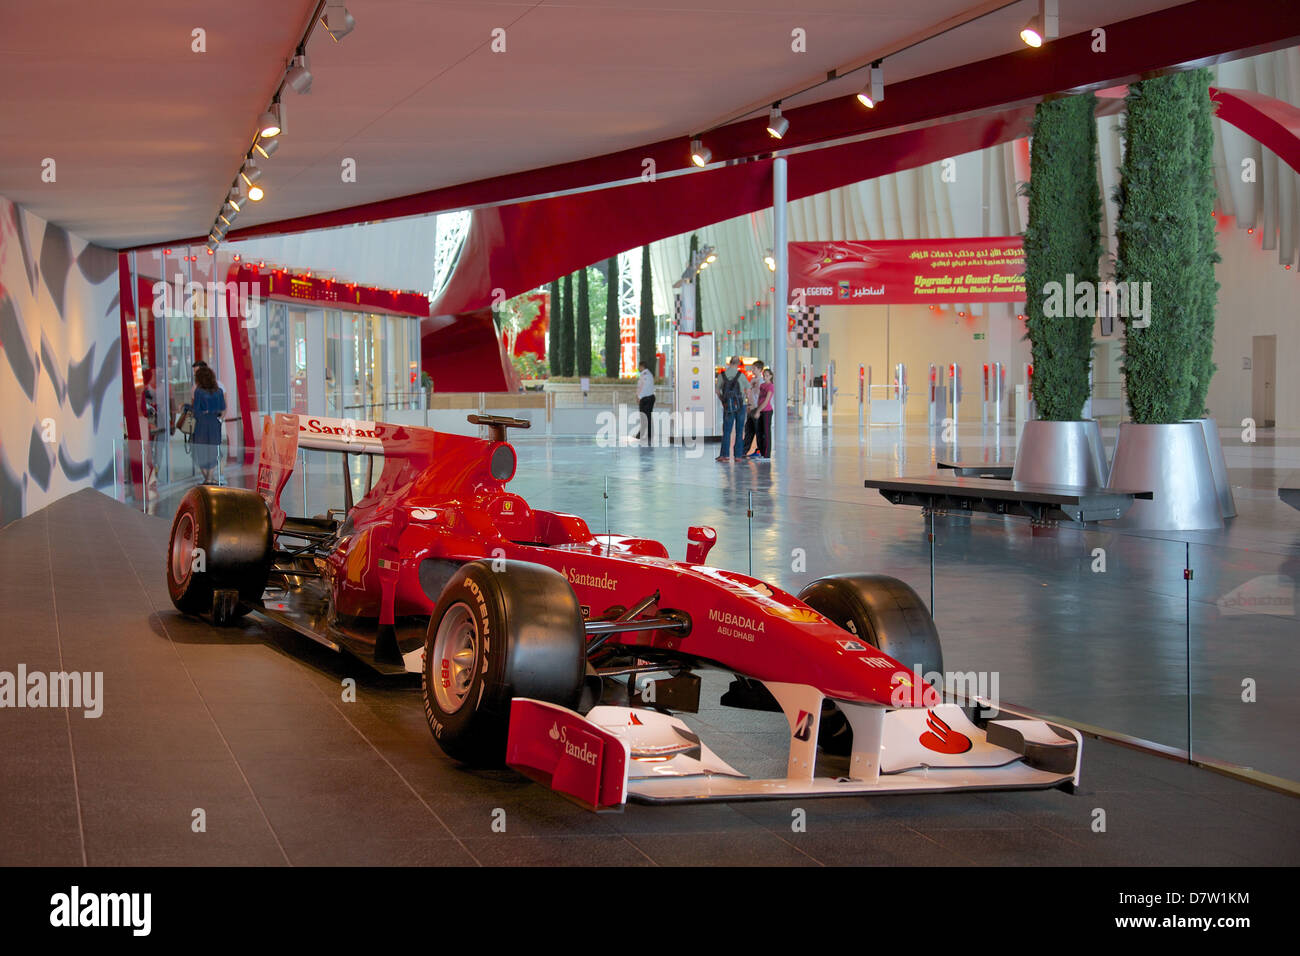 Formula 1 Racing Car, Ferrari World, Yas Island, Abu Dhabi, United Arab Emirates, Middle East Stock Photo